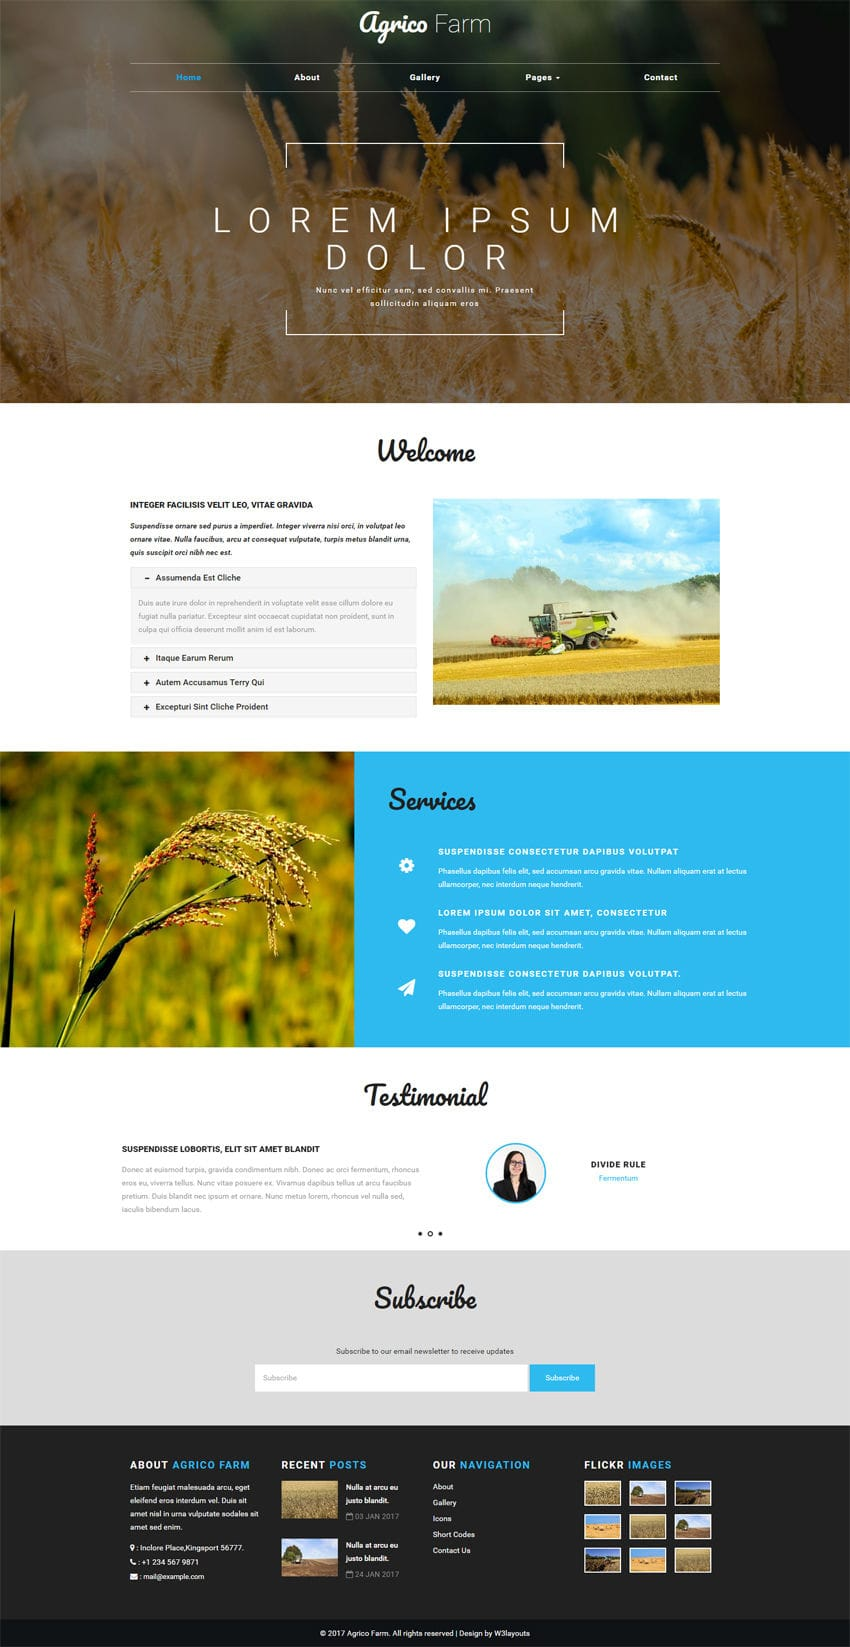 Best Designed Farm Websites